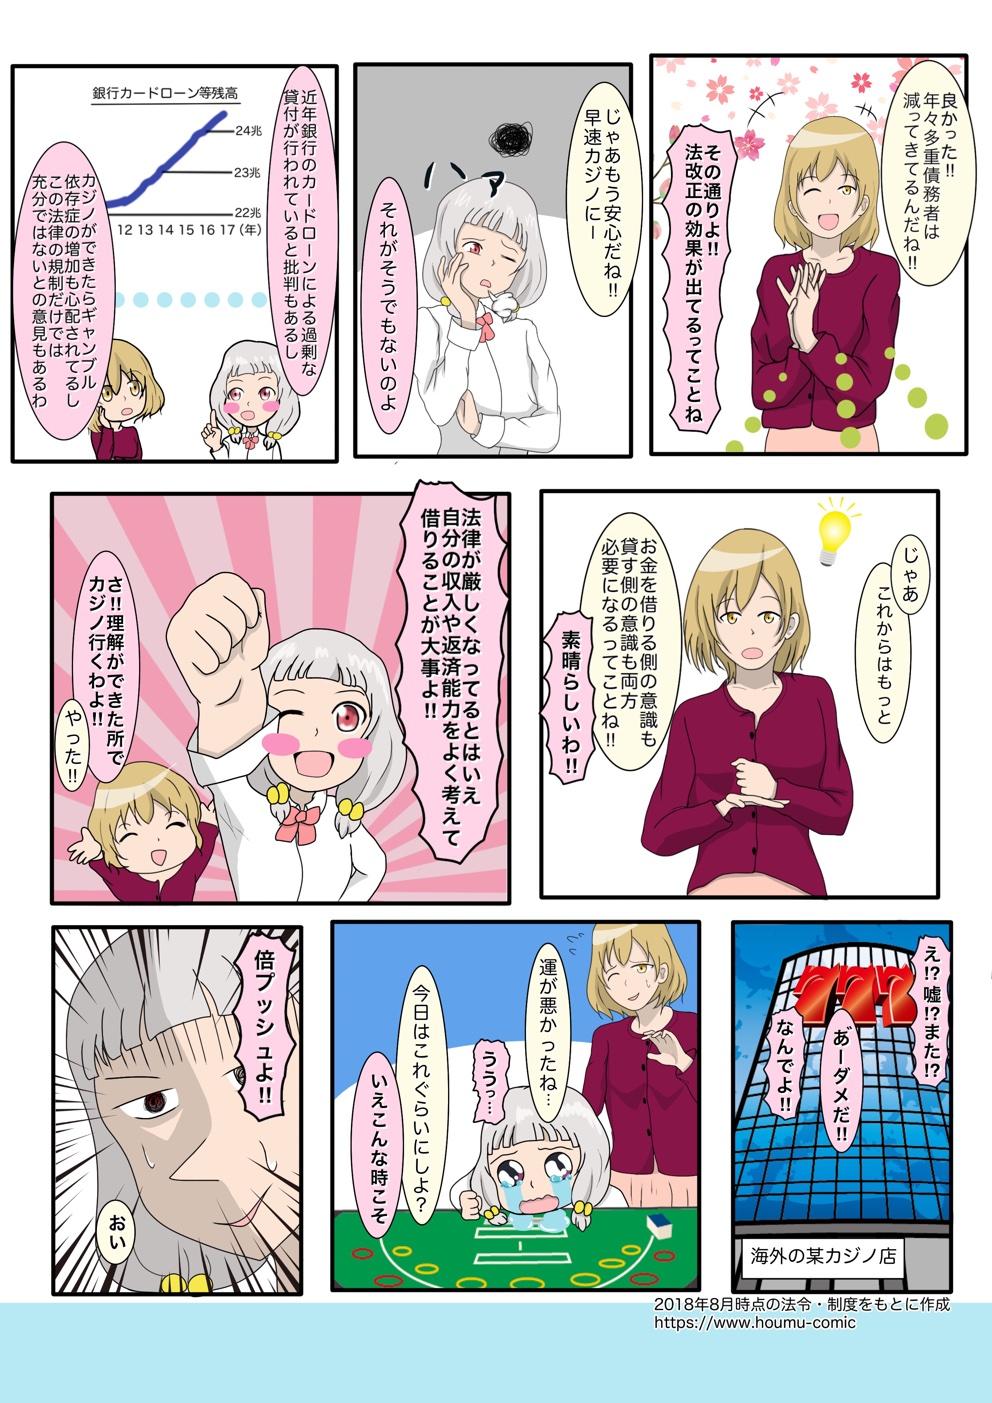 f:id:houmu_comic:20180820211049j:plain